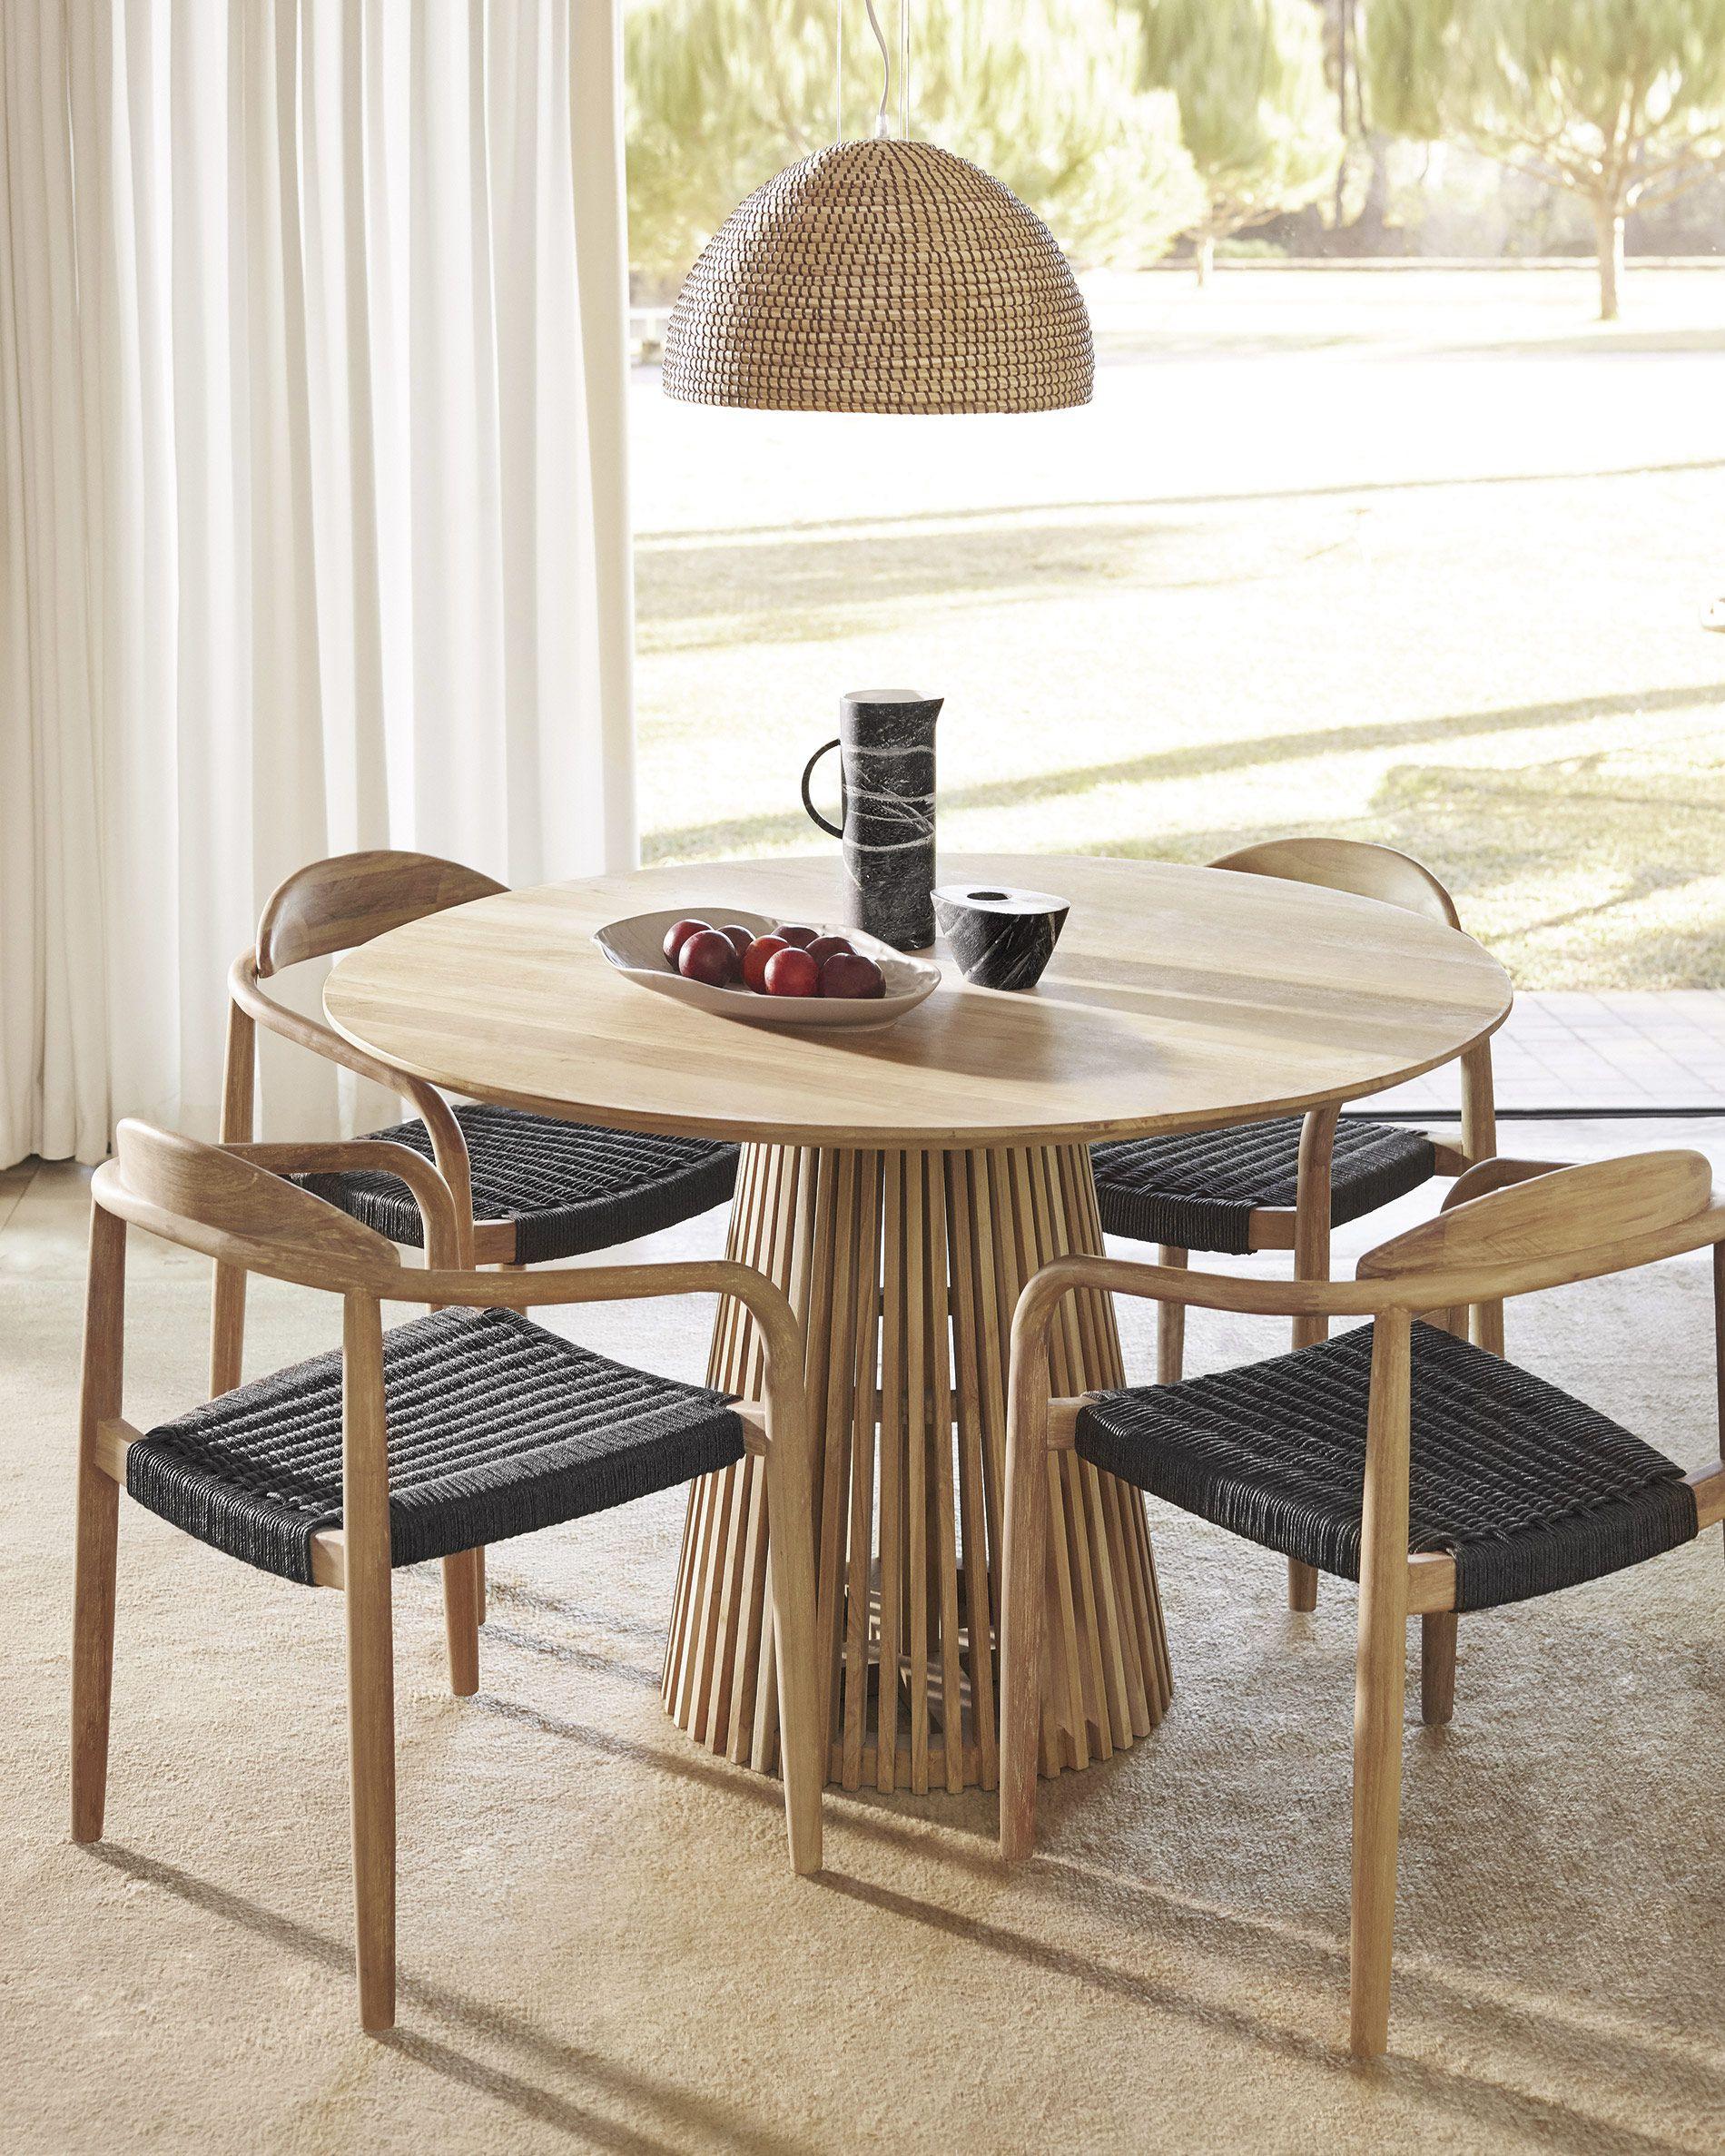 Jeanette Table Ø 120 Cm | Kave Home® destiné Kave Home